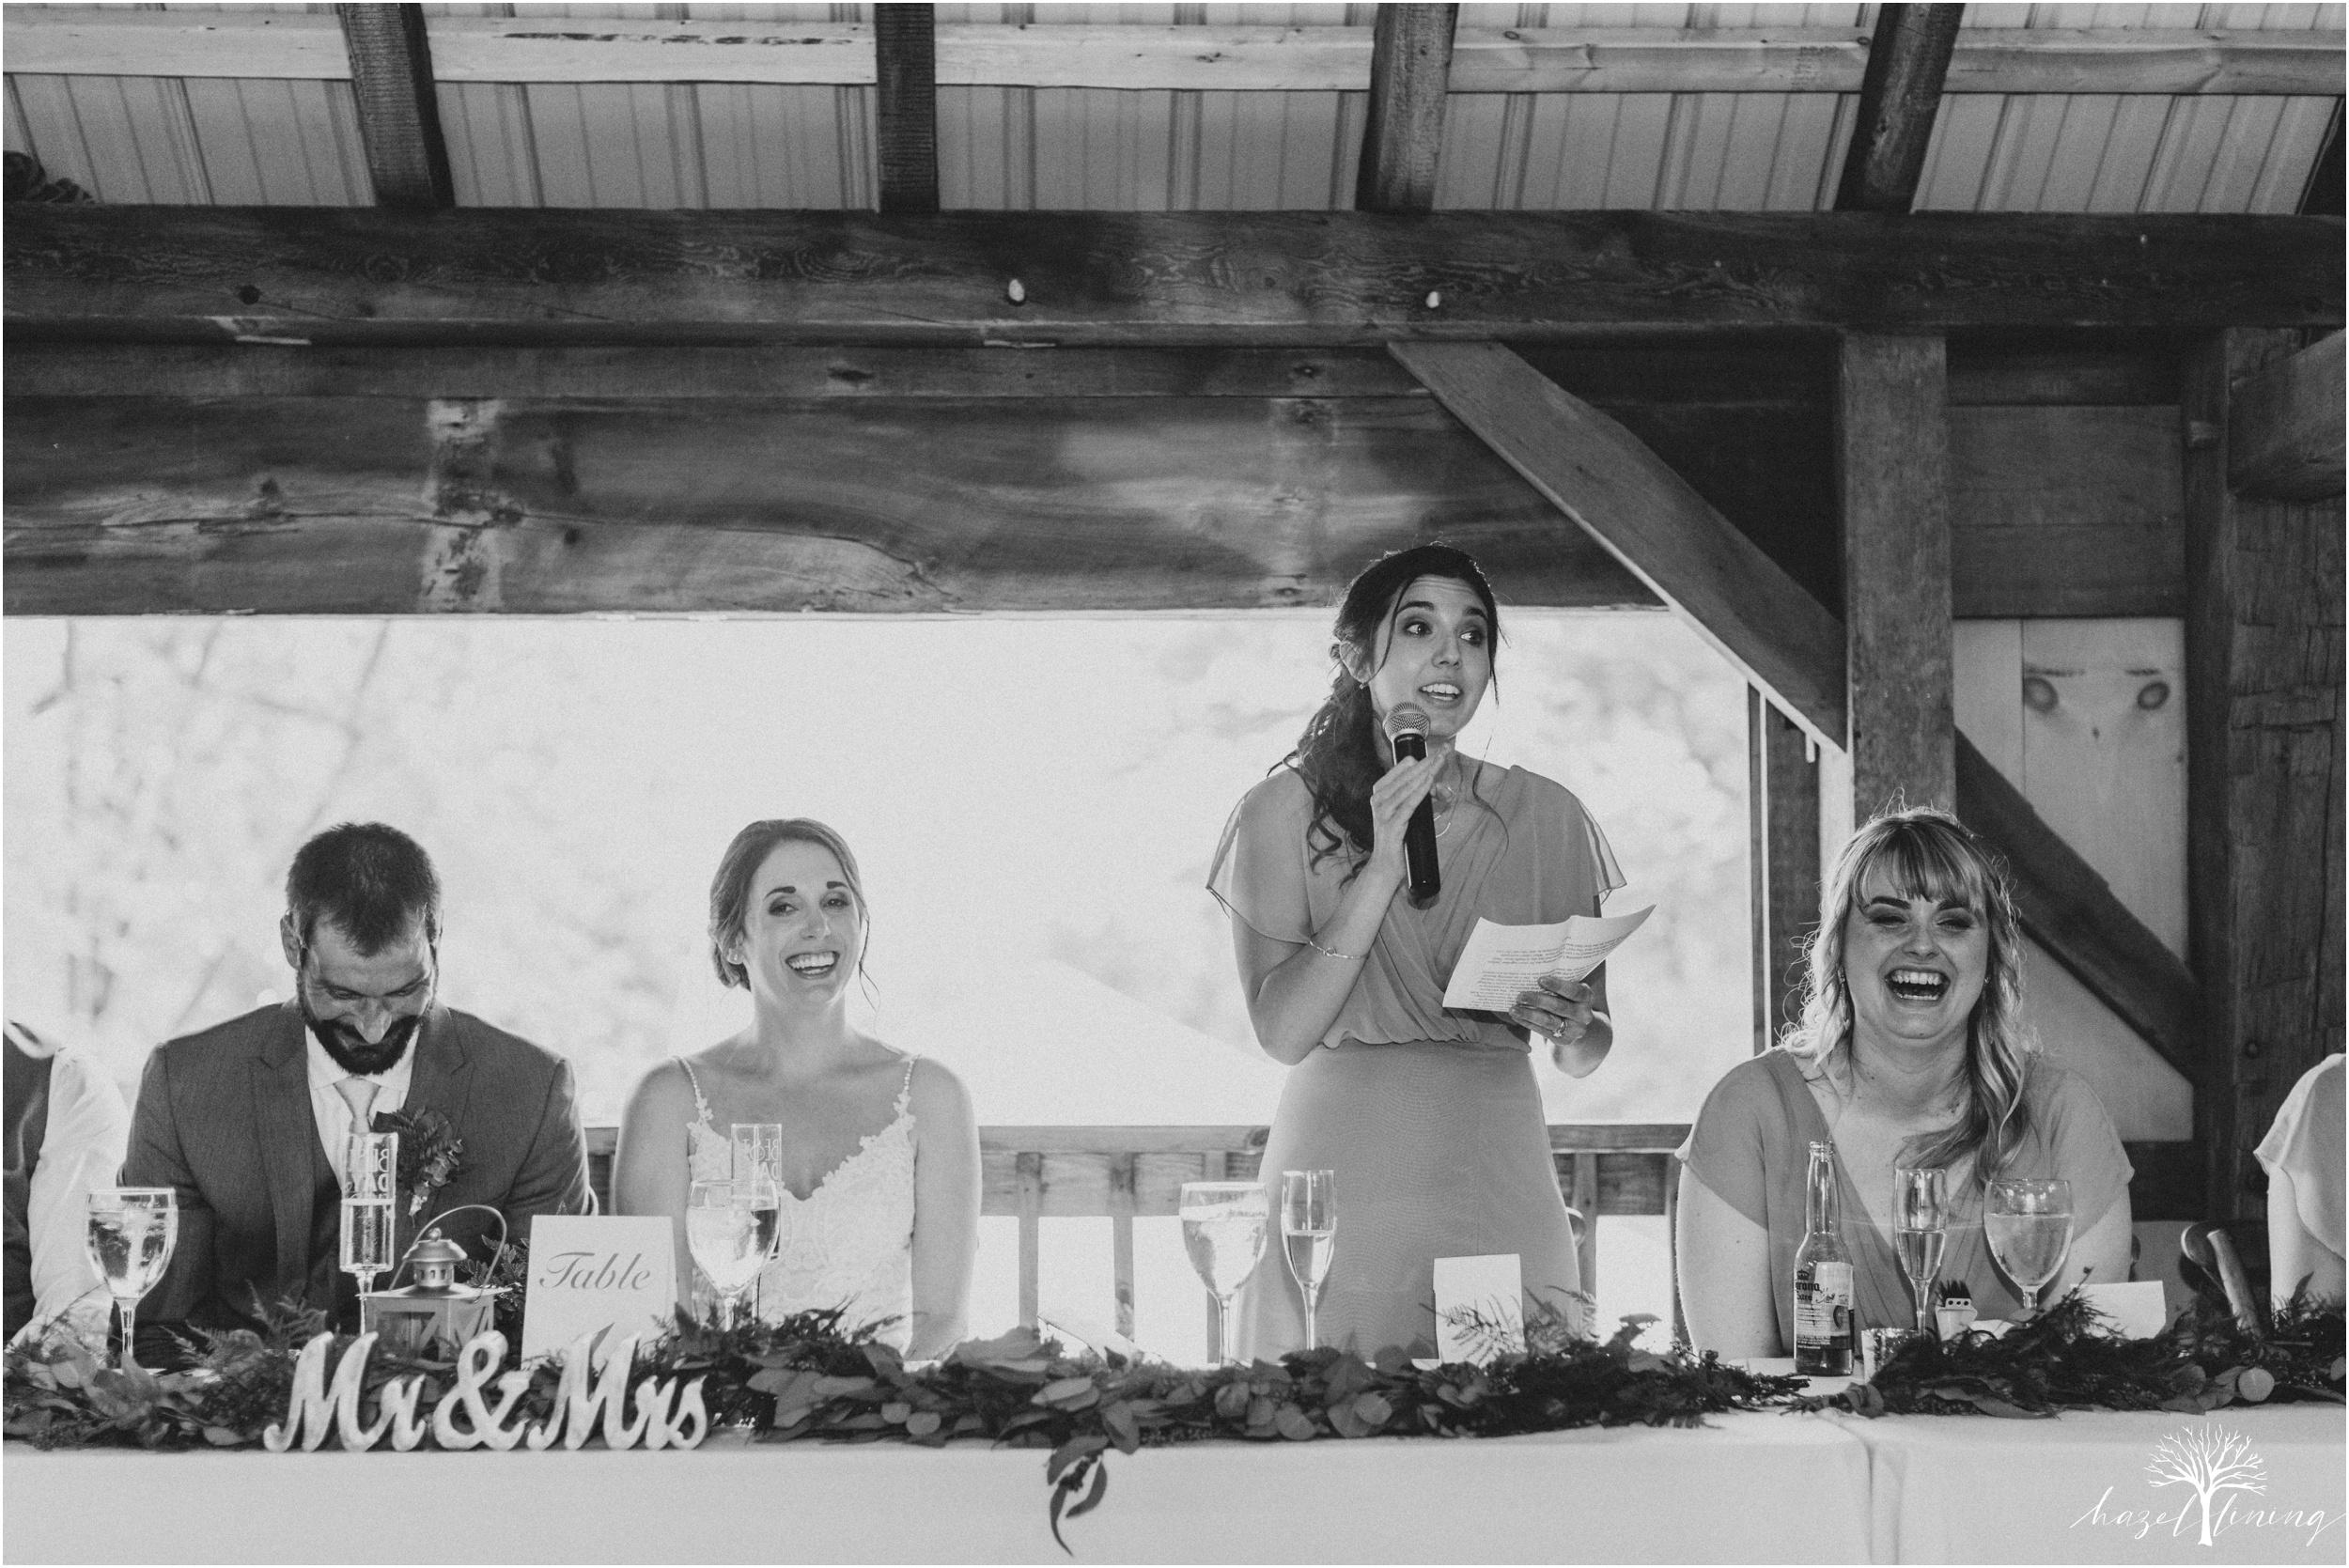 hazel-lining-travel-wedding-elopement-photography-lisa-landon-shoemaker-the-farm-bakery-and-events-bucks-county-quakertown-pennsylvania-summer-country-outdoor-farm-wedding_0122.jpg